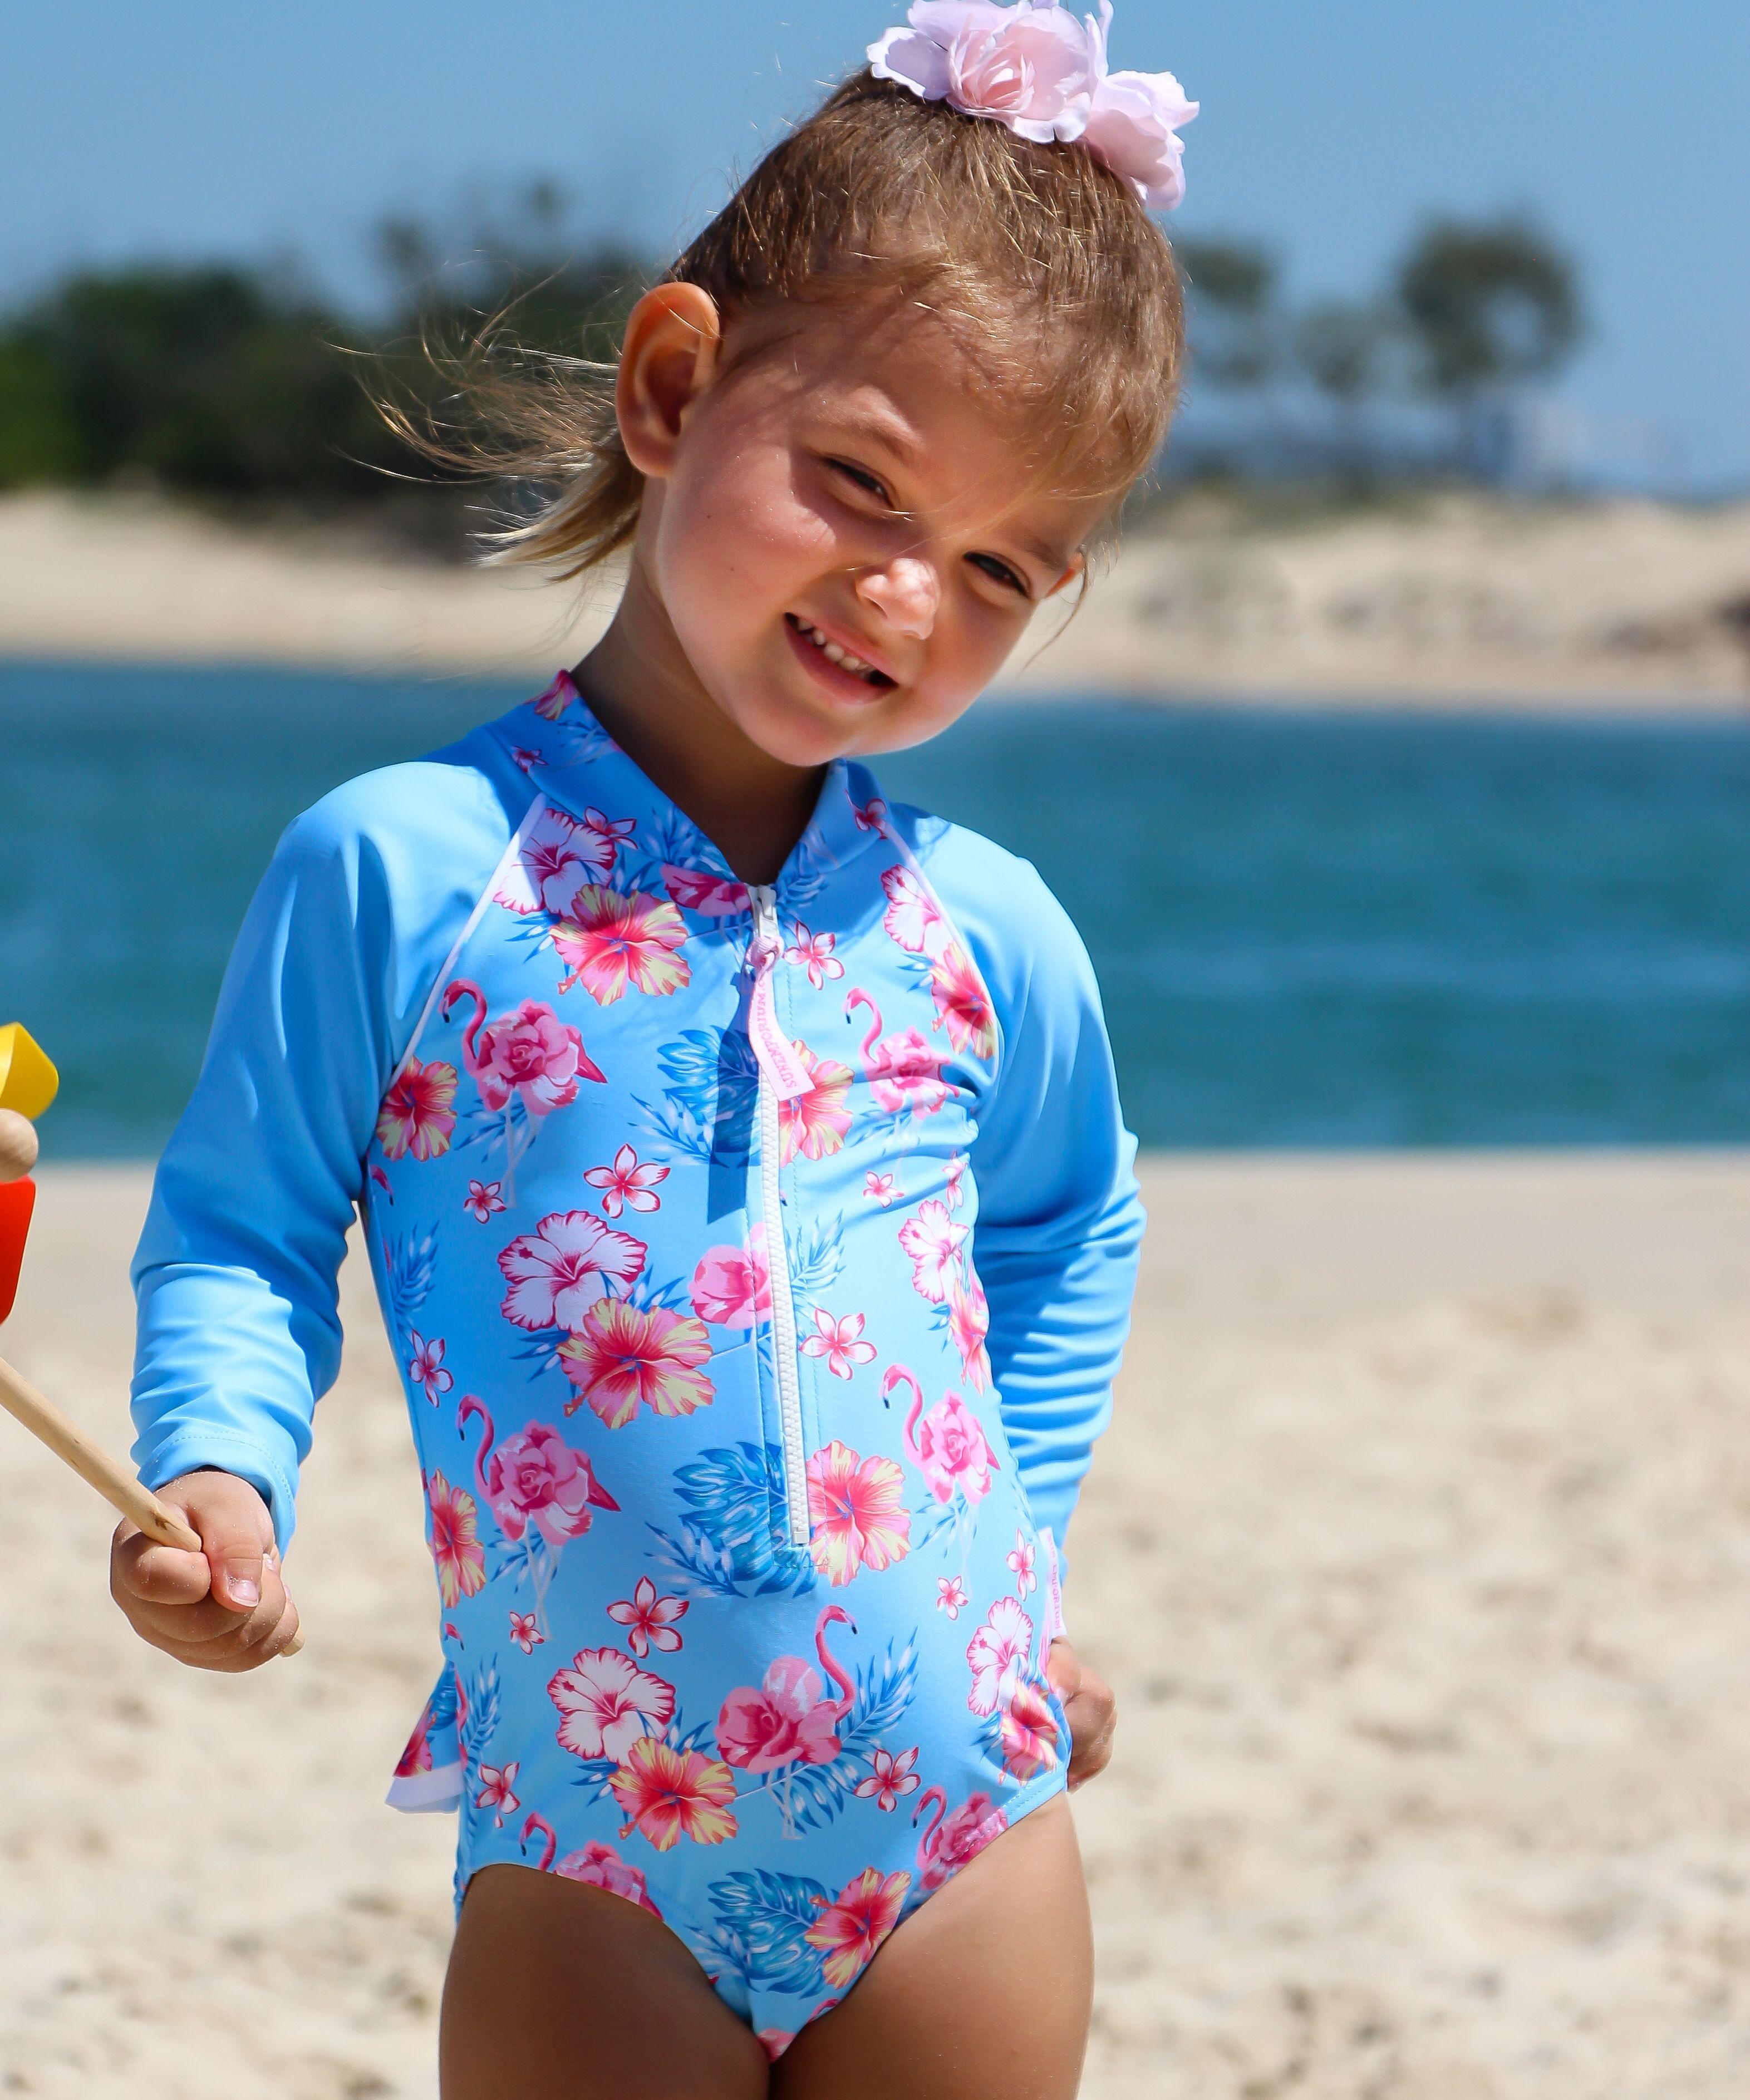 Baby Boy Swimsuit Toddler One Piece Swimwear Kid Stripe Rash Guard Sun Protection Sunsuit Zip with Hat 1-6t